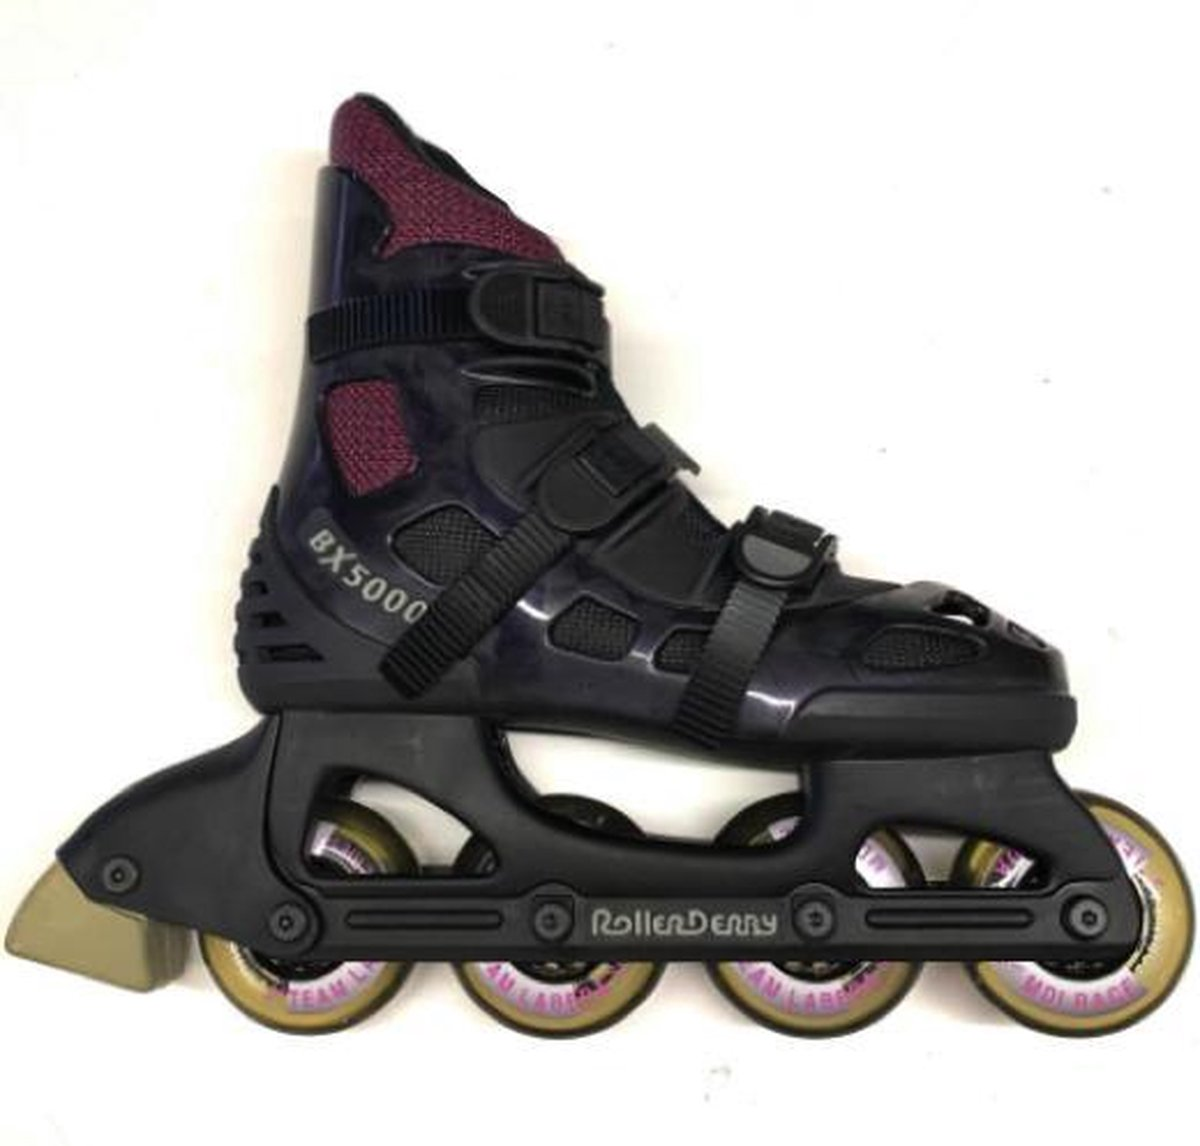 ROLLER DERBY BX5000 Inline Skates Heren - Maat US 10